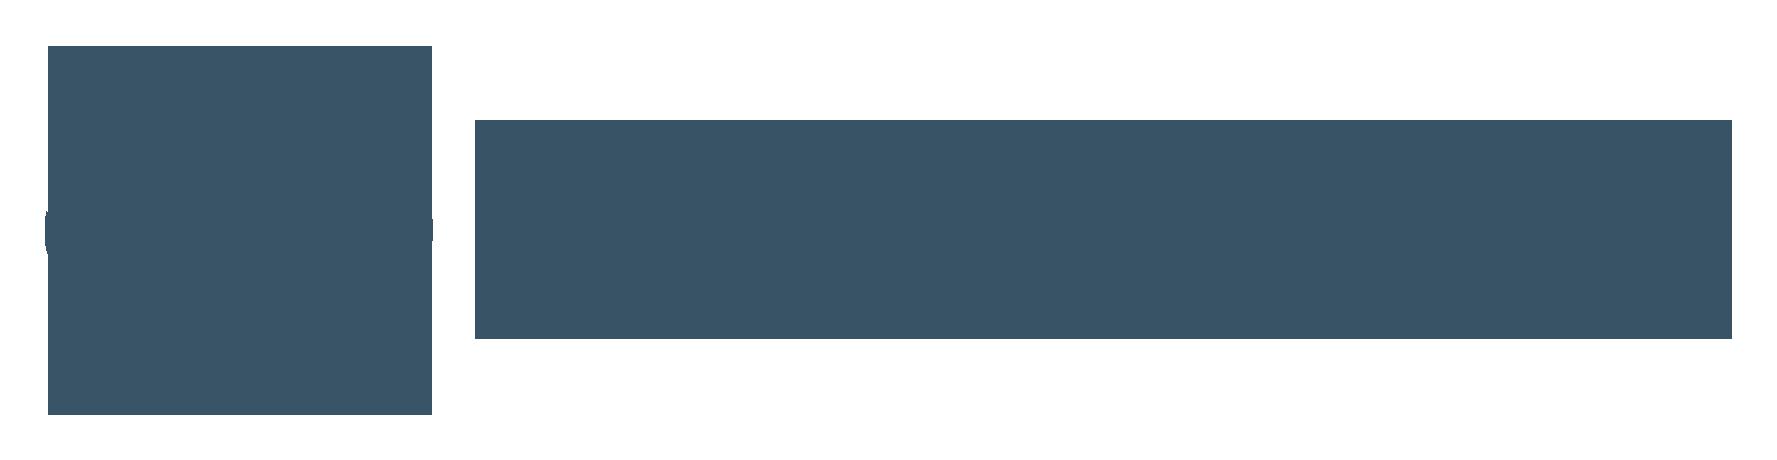 BuddoBot Inc.